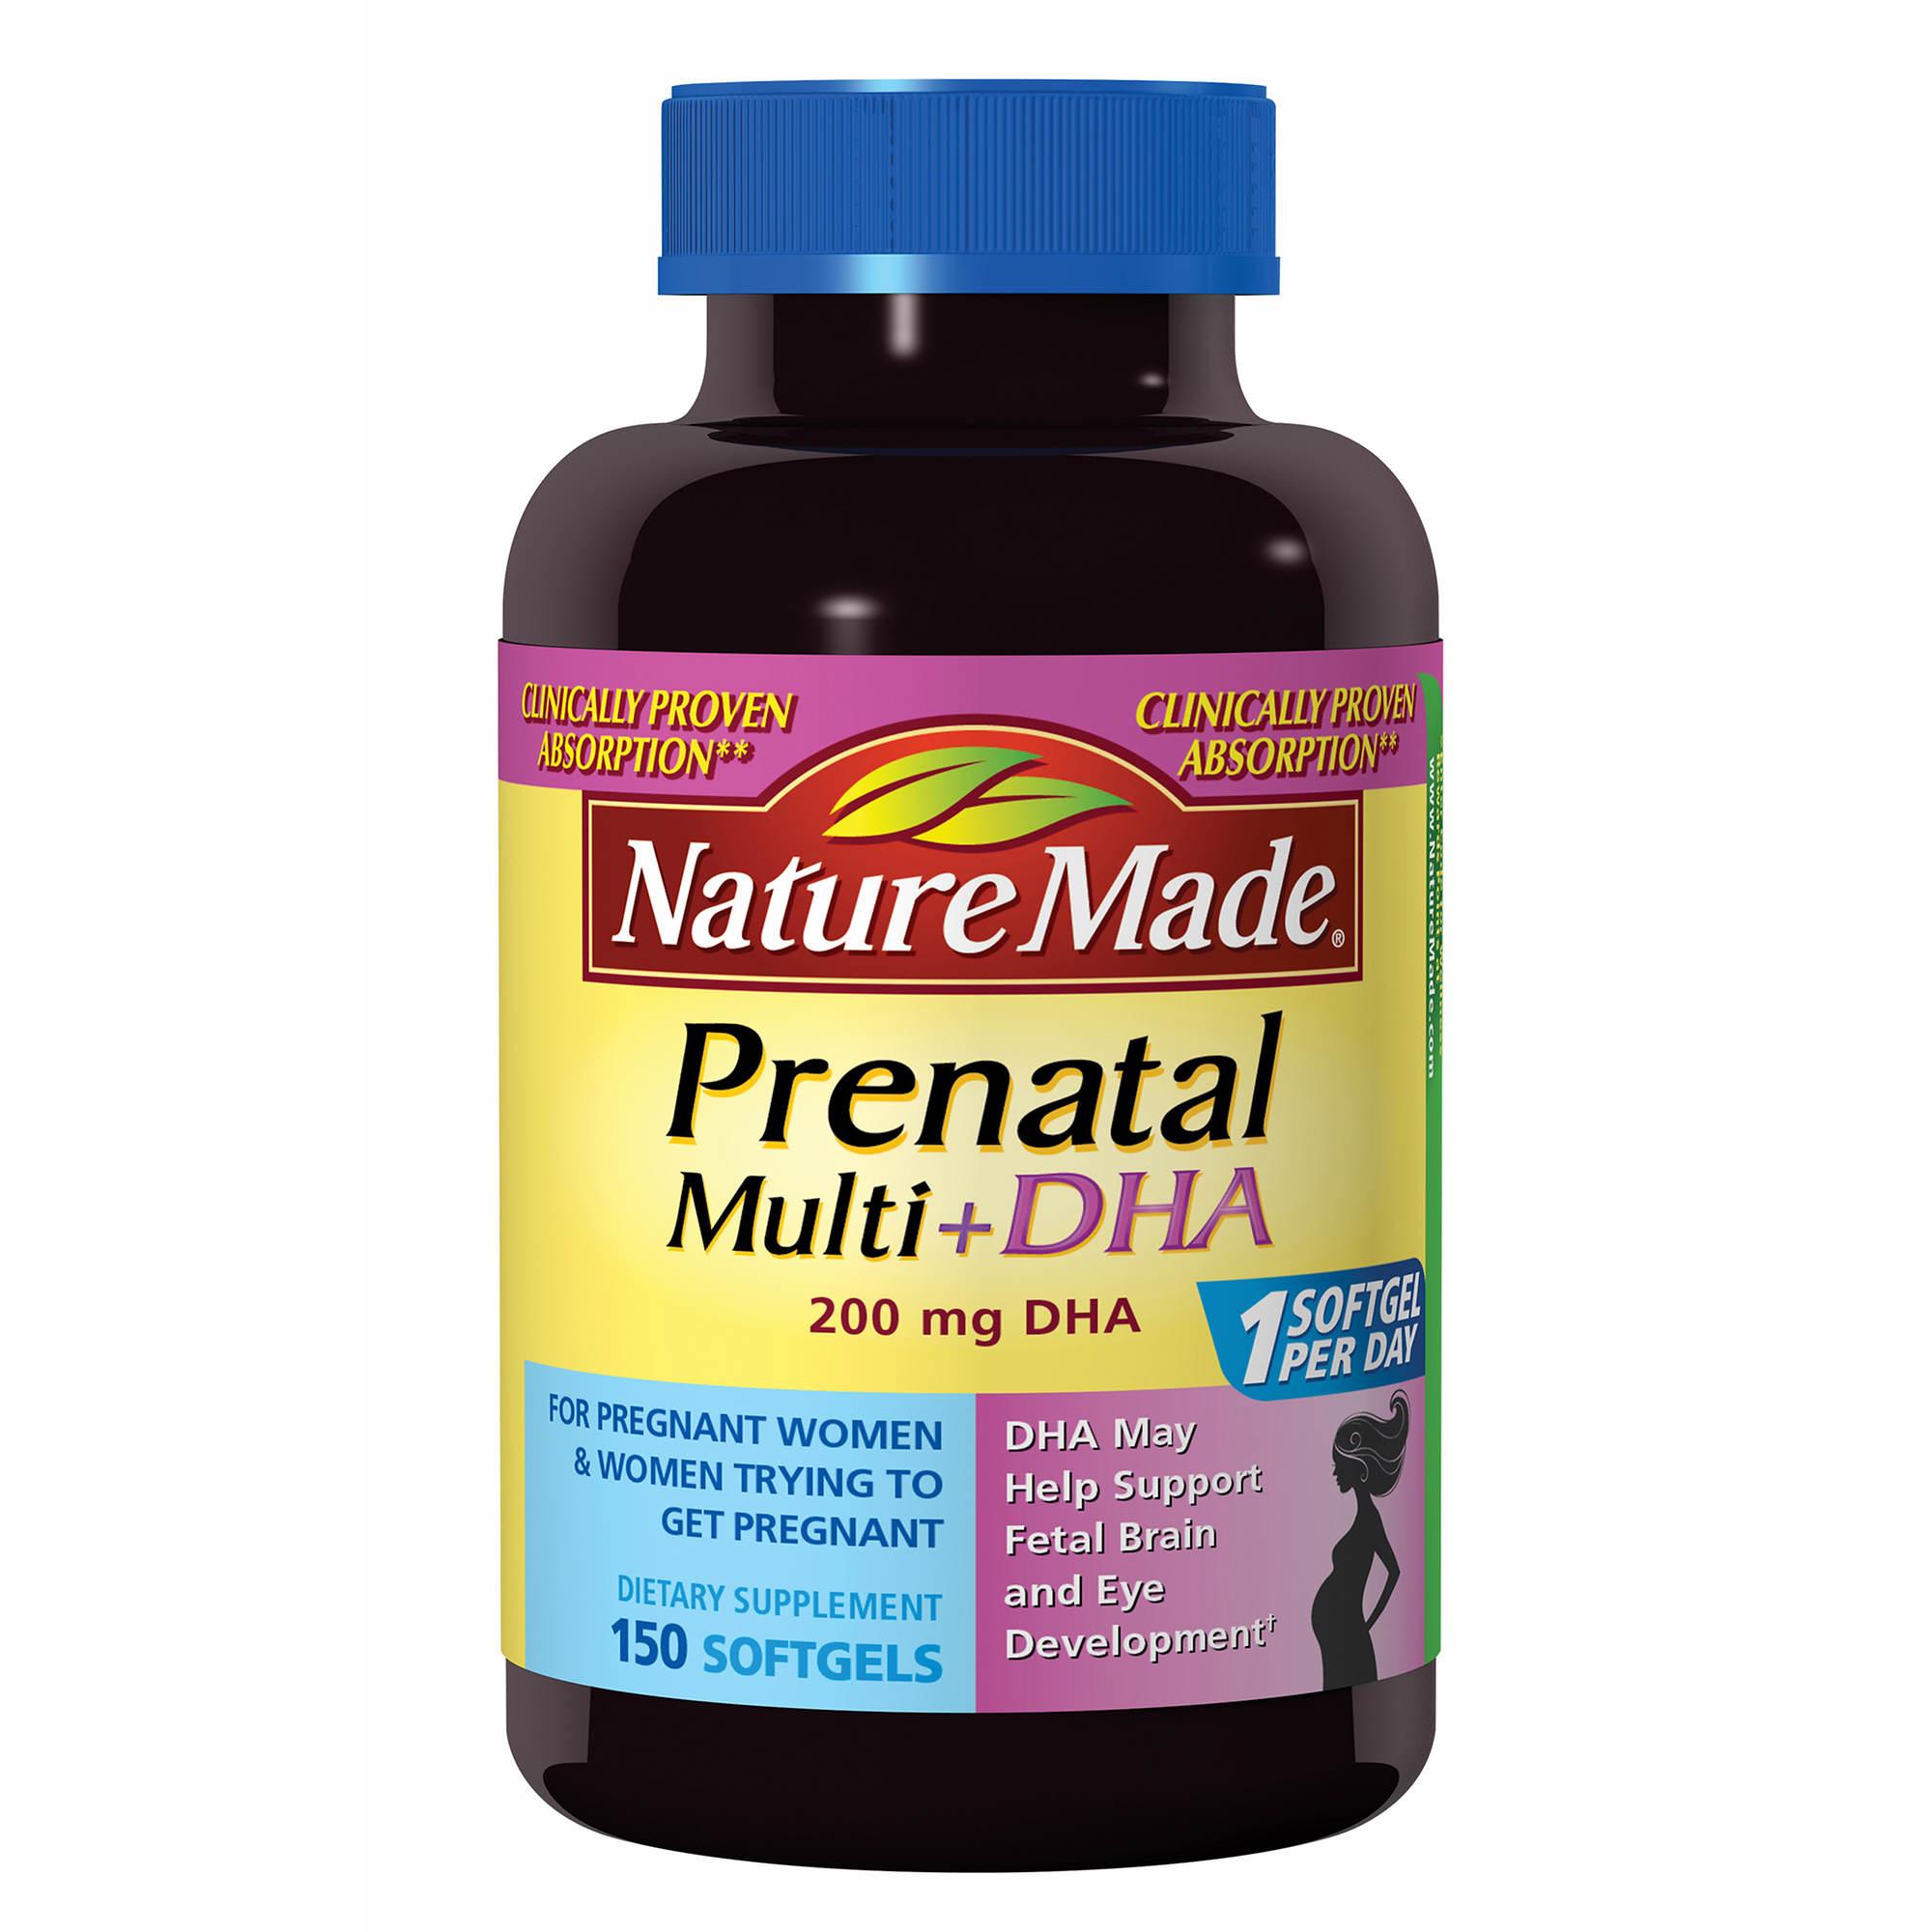 Liquid prenatal vitamins with dha